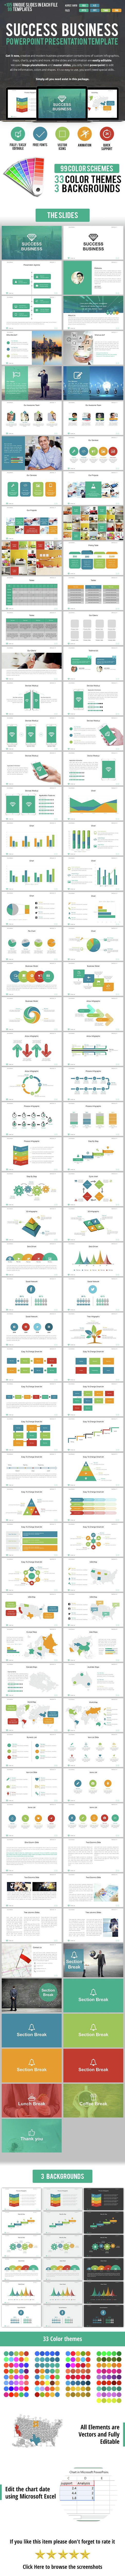 Success Business PowerPoint Presentation Template - Business PowerPoint Templates